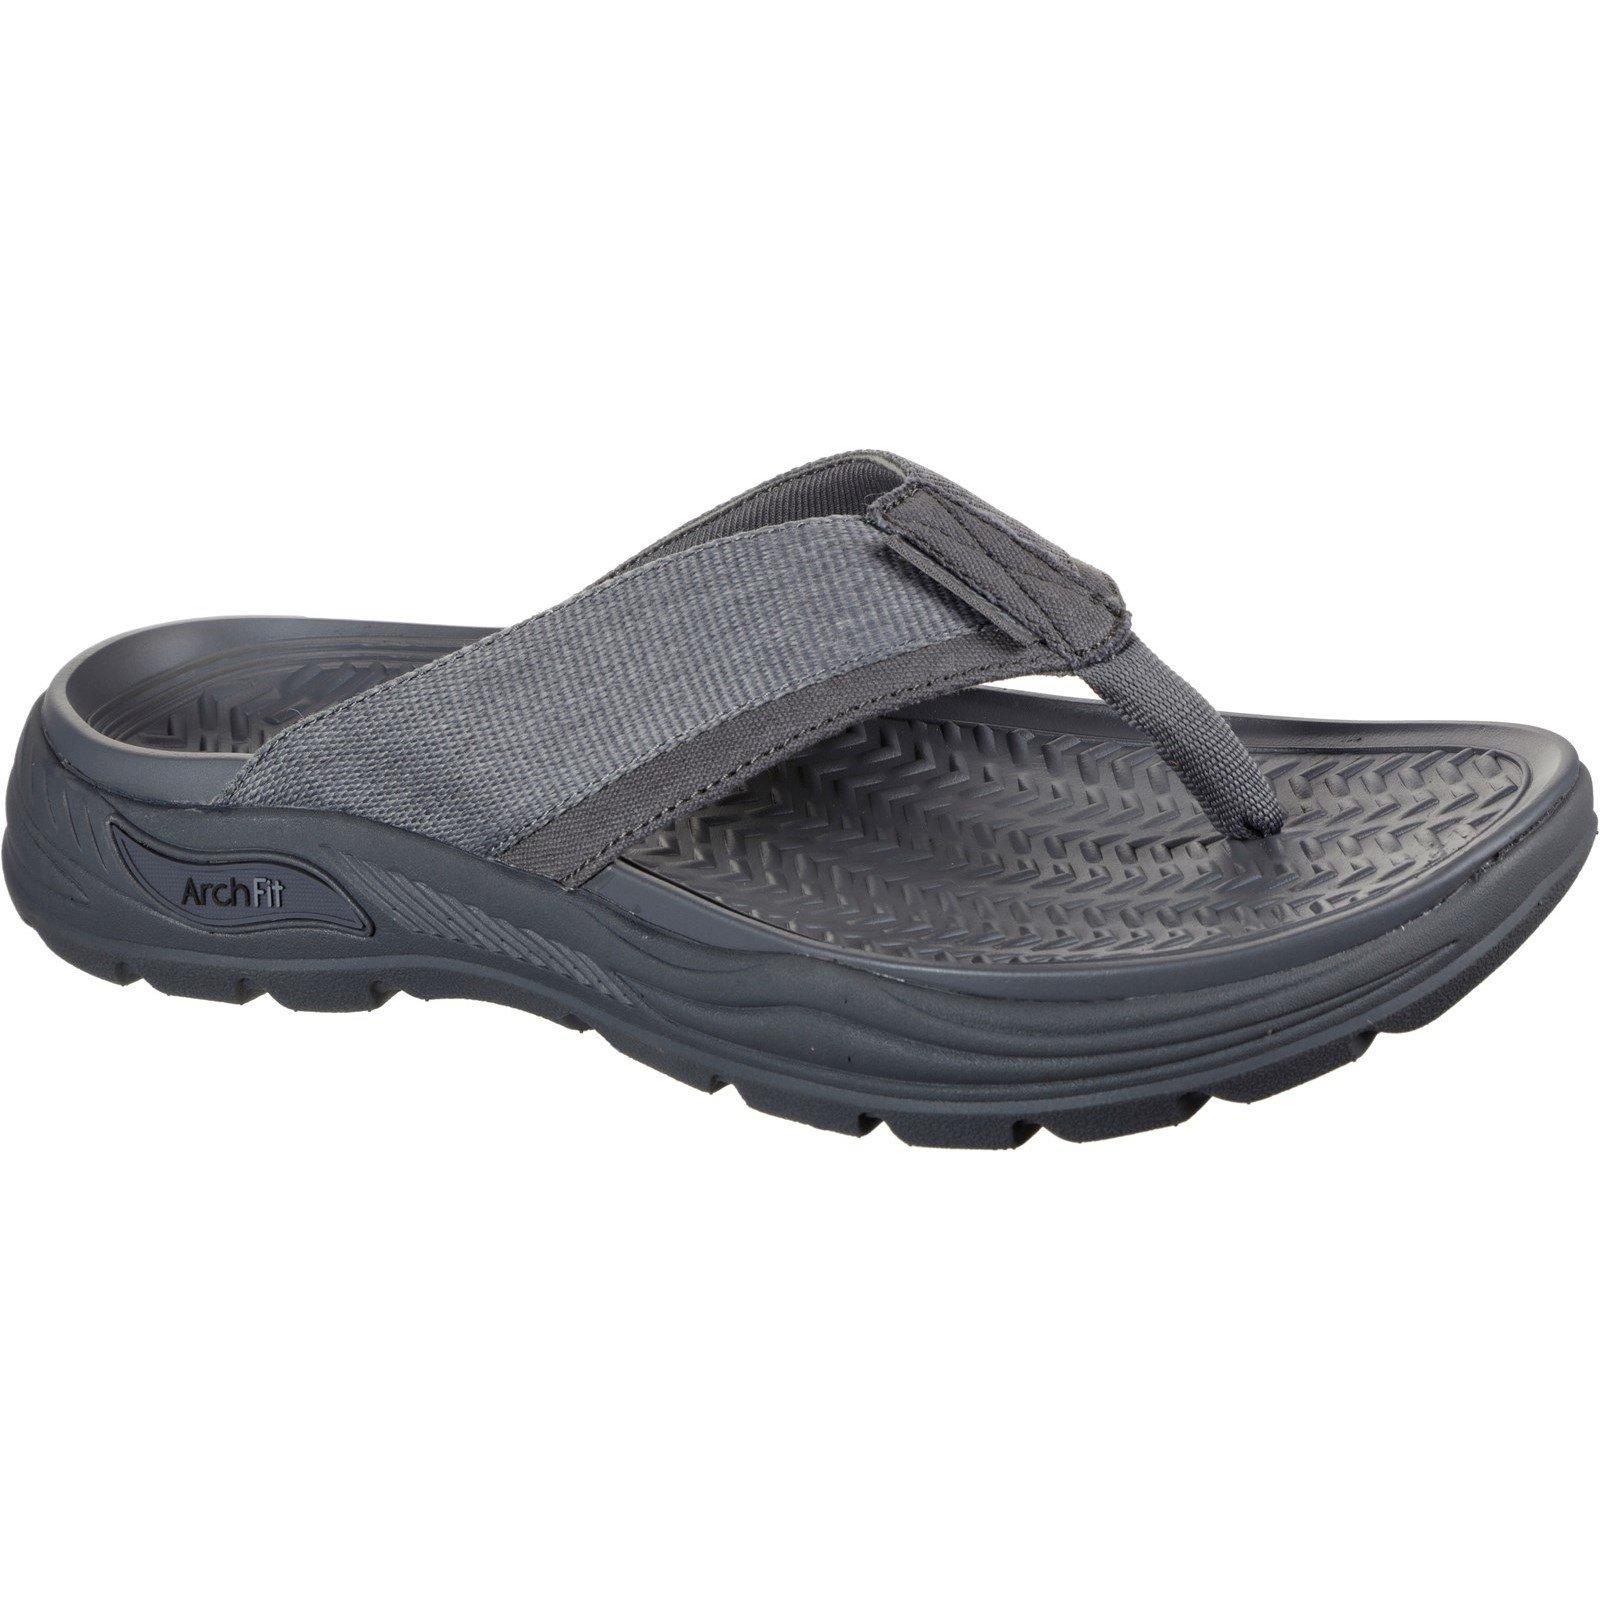 Skechers Men's Arch Fit Motley Dolano Summer Sandal Charcoal 32209 - Charcoal 7